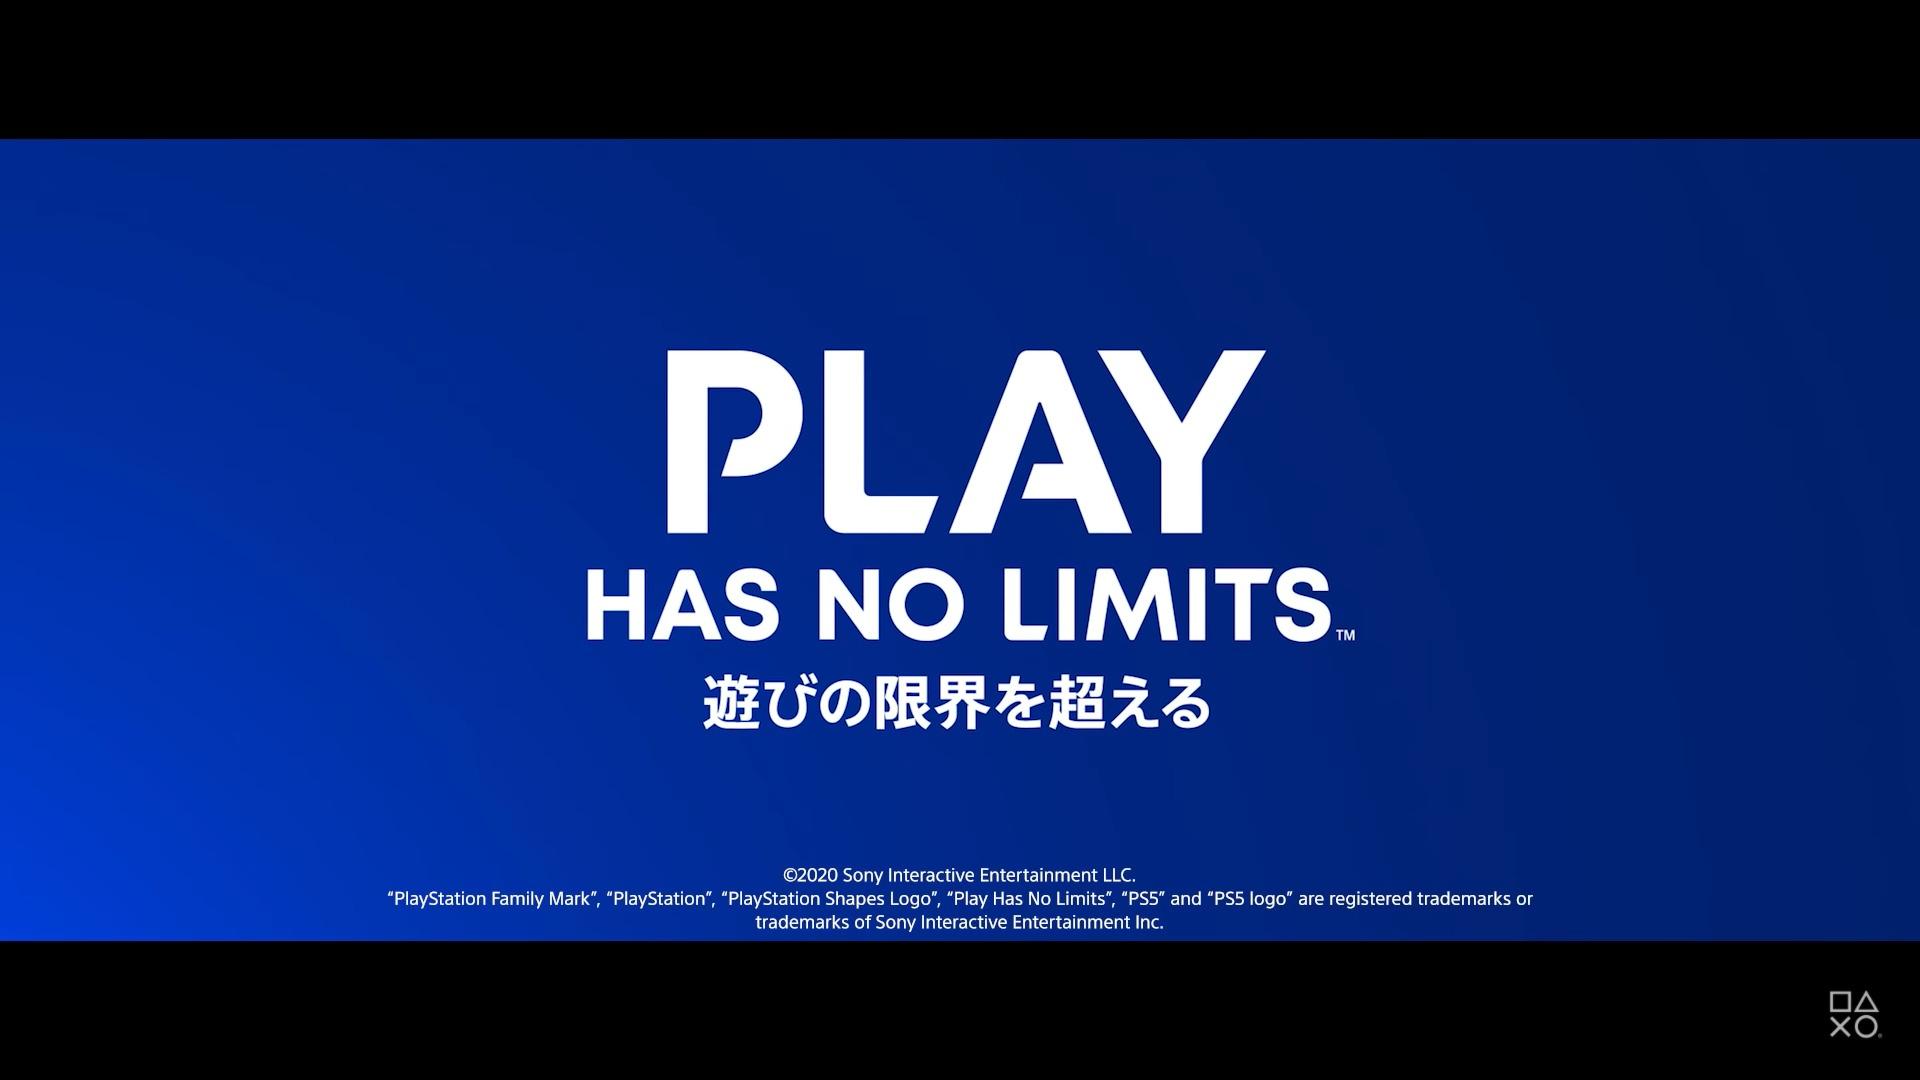 PS5のキャッチコピーは「遊びの限界を超える」